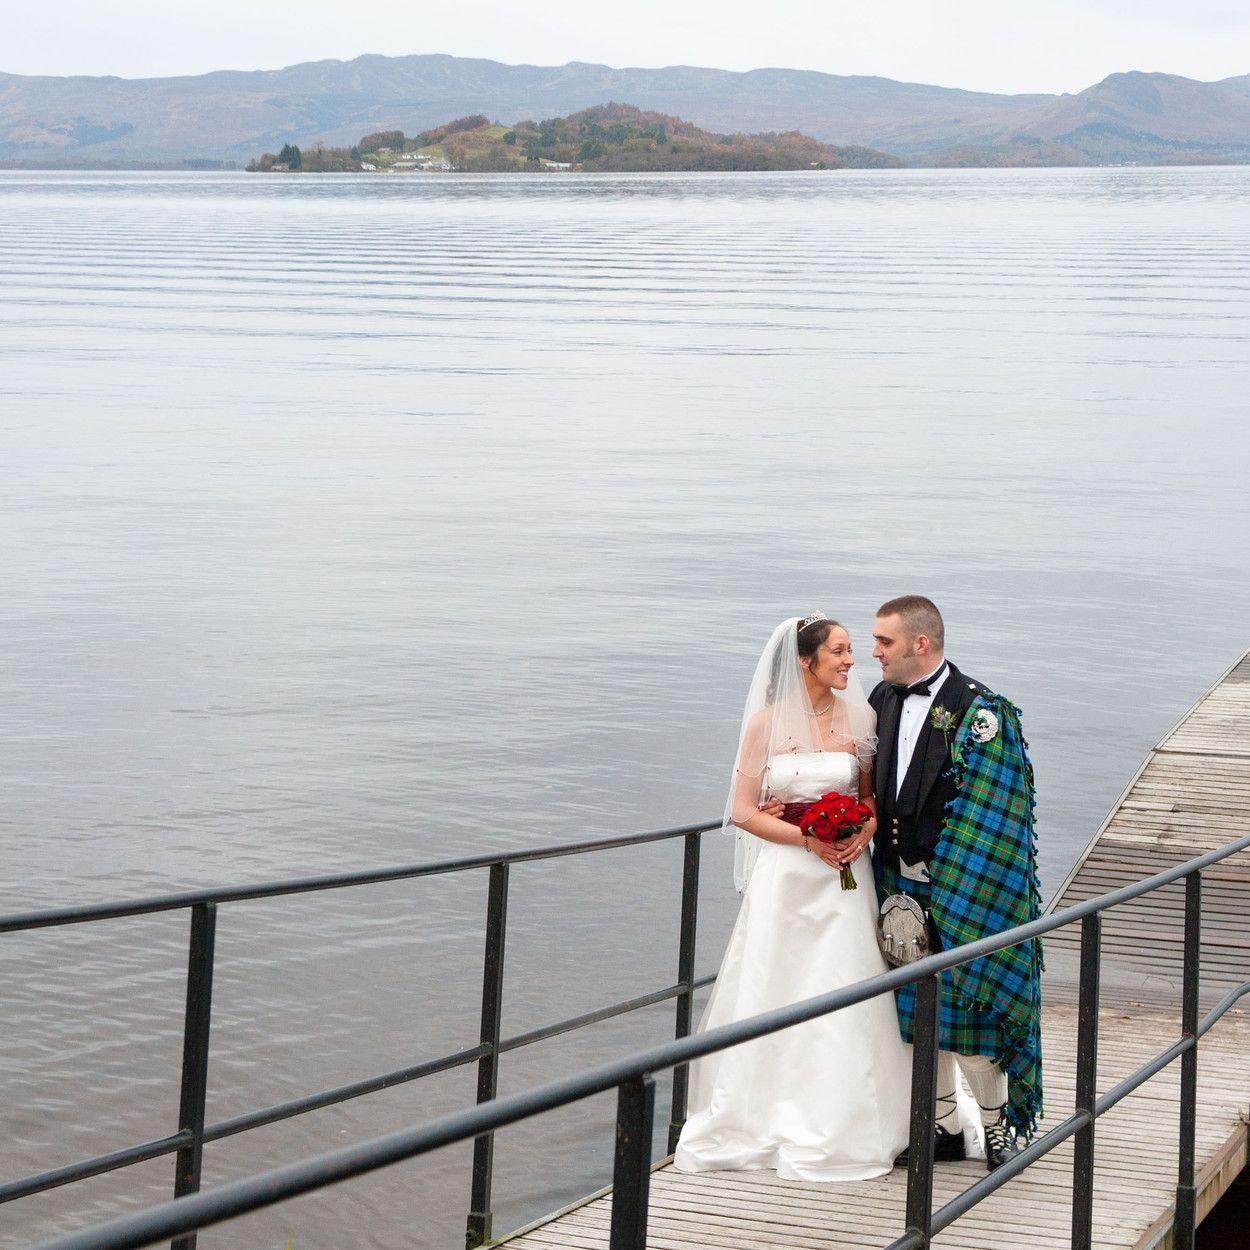 Laua and Alan's Wedding at the Cruin Loch Lomond